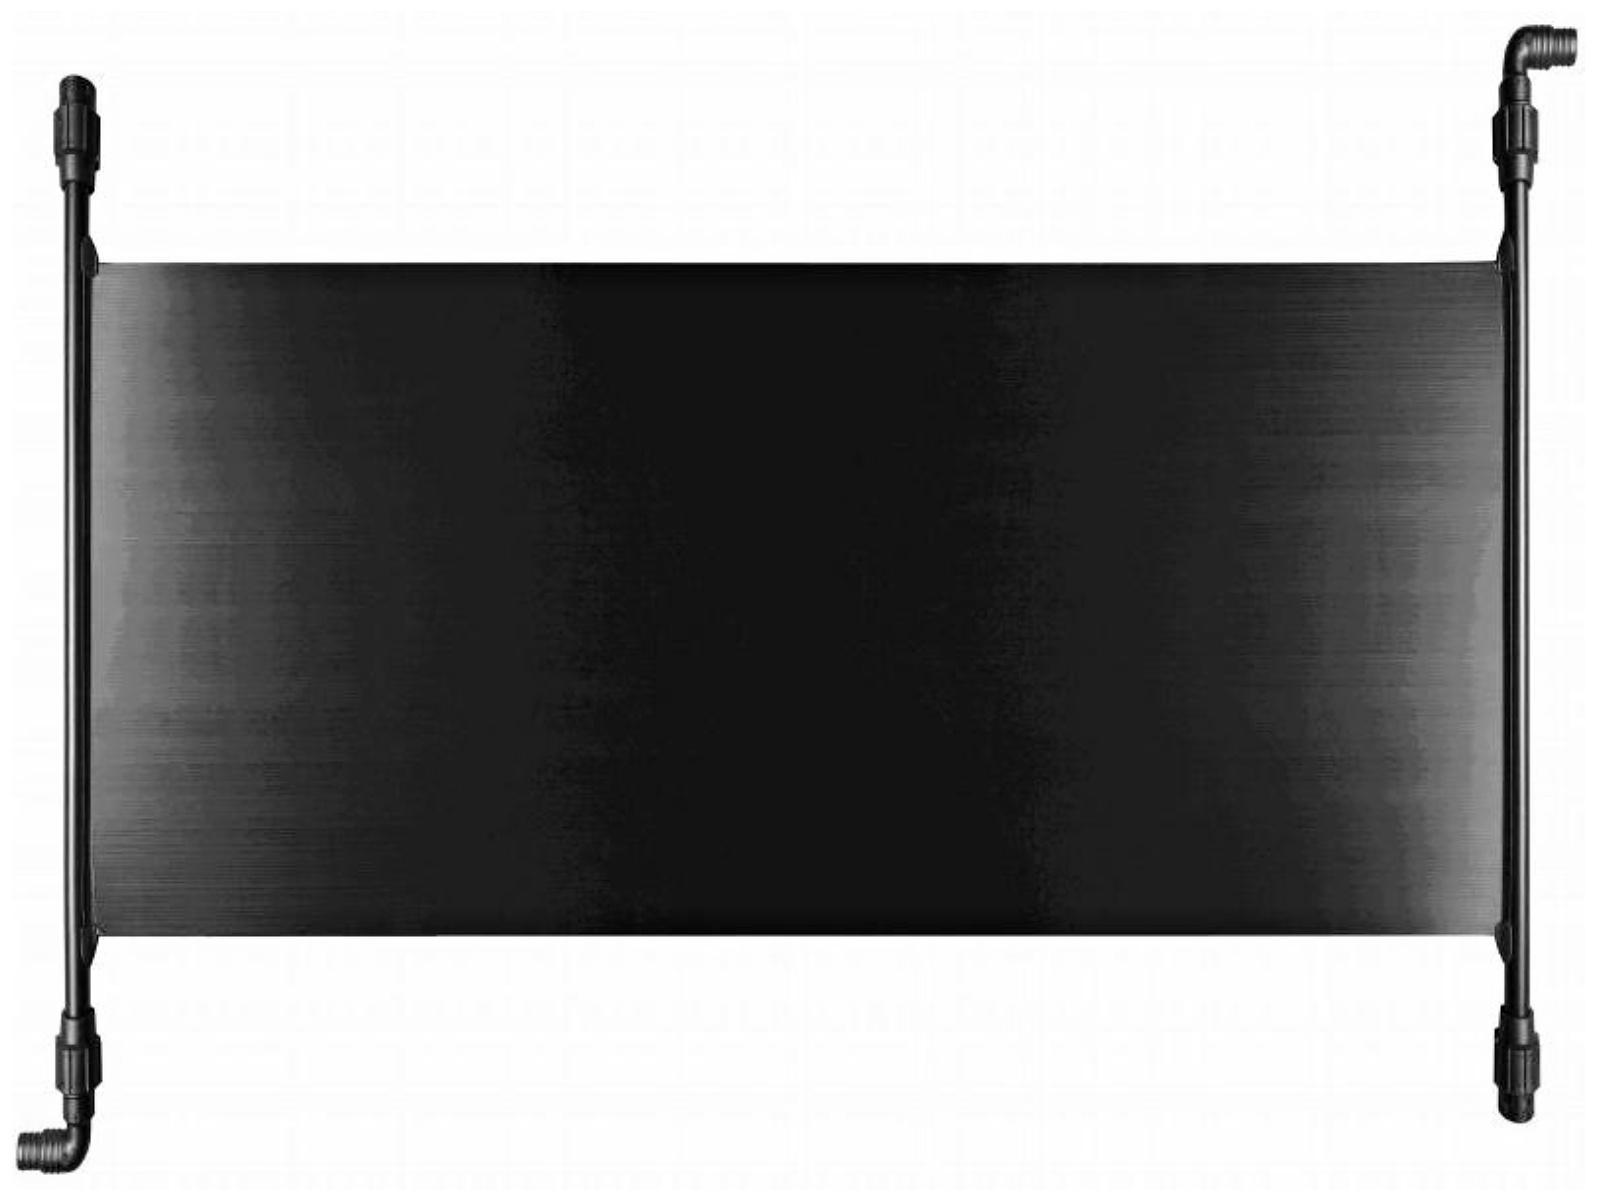 MARIMEX 10741001 Slim 360 Solární ohřev